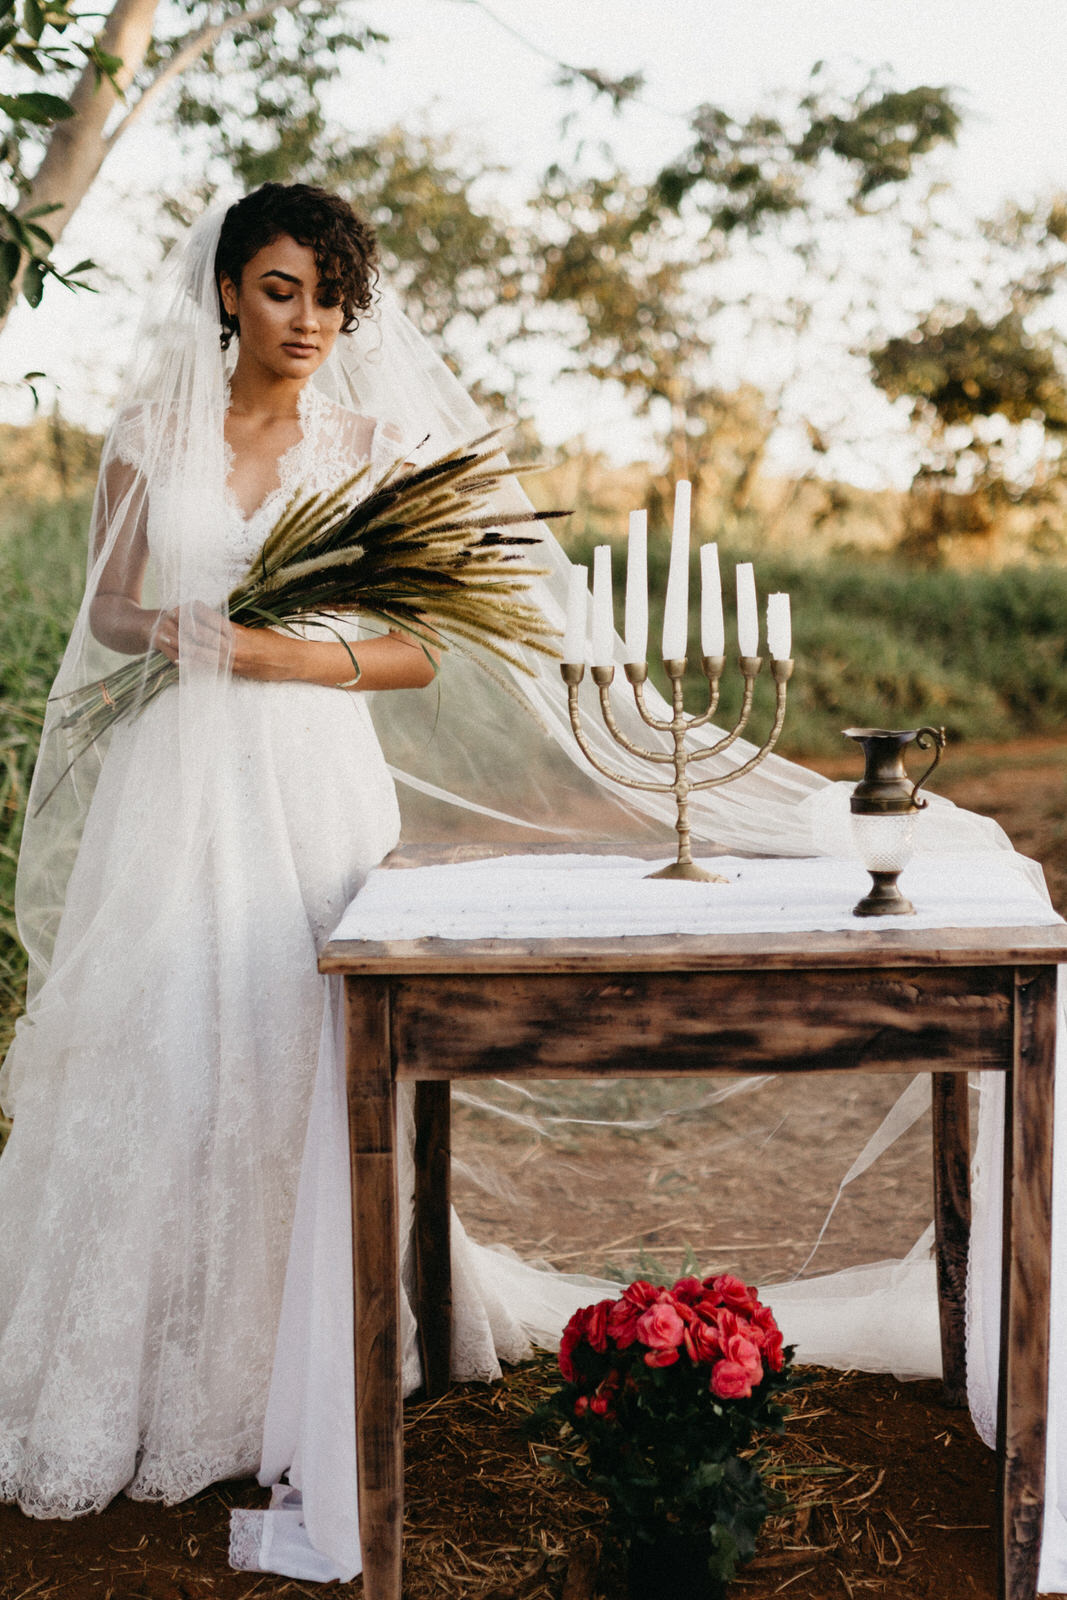 Céu_fotografia_casamentos_goiás_brasil_folk_noivas_brides_alternativo (48).jpg